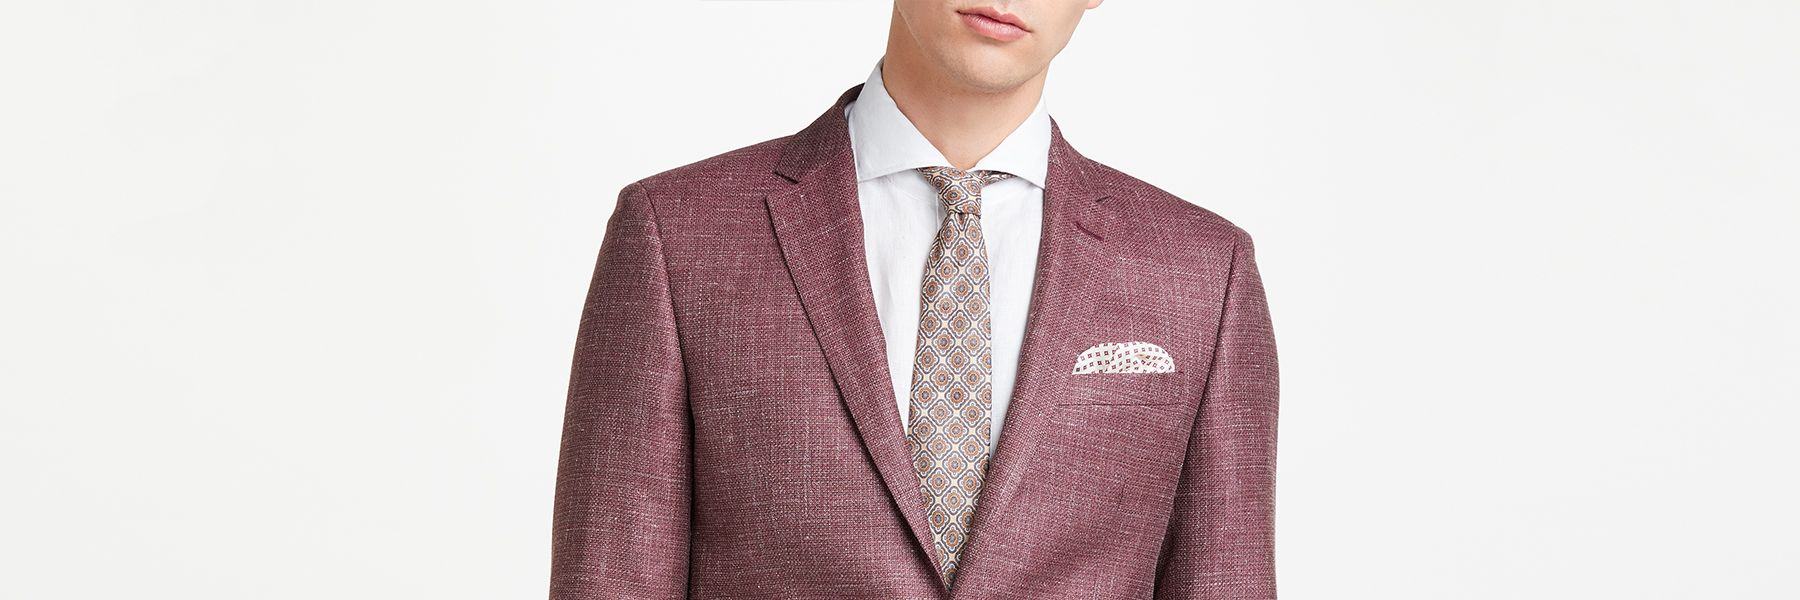 53f3c5b8f2c International clothing size conversion